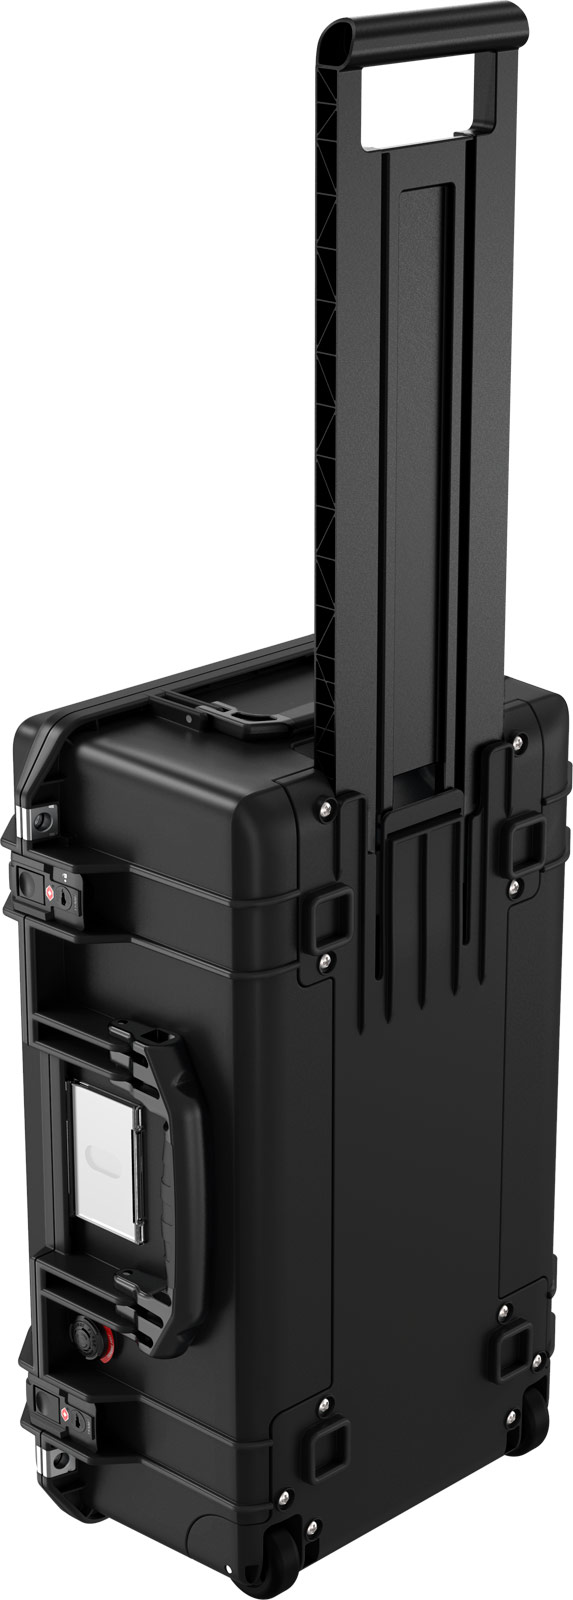 peli 1535 air wheeled luggage case